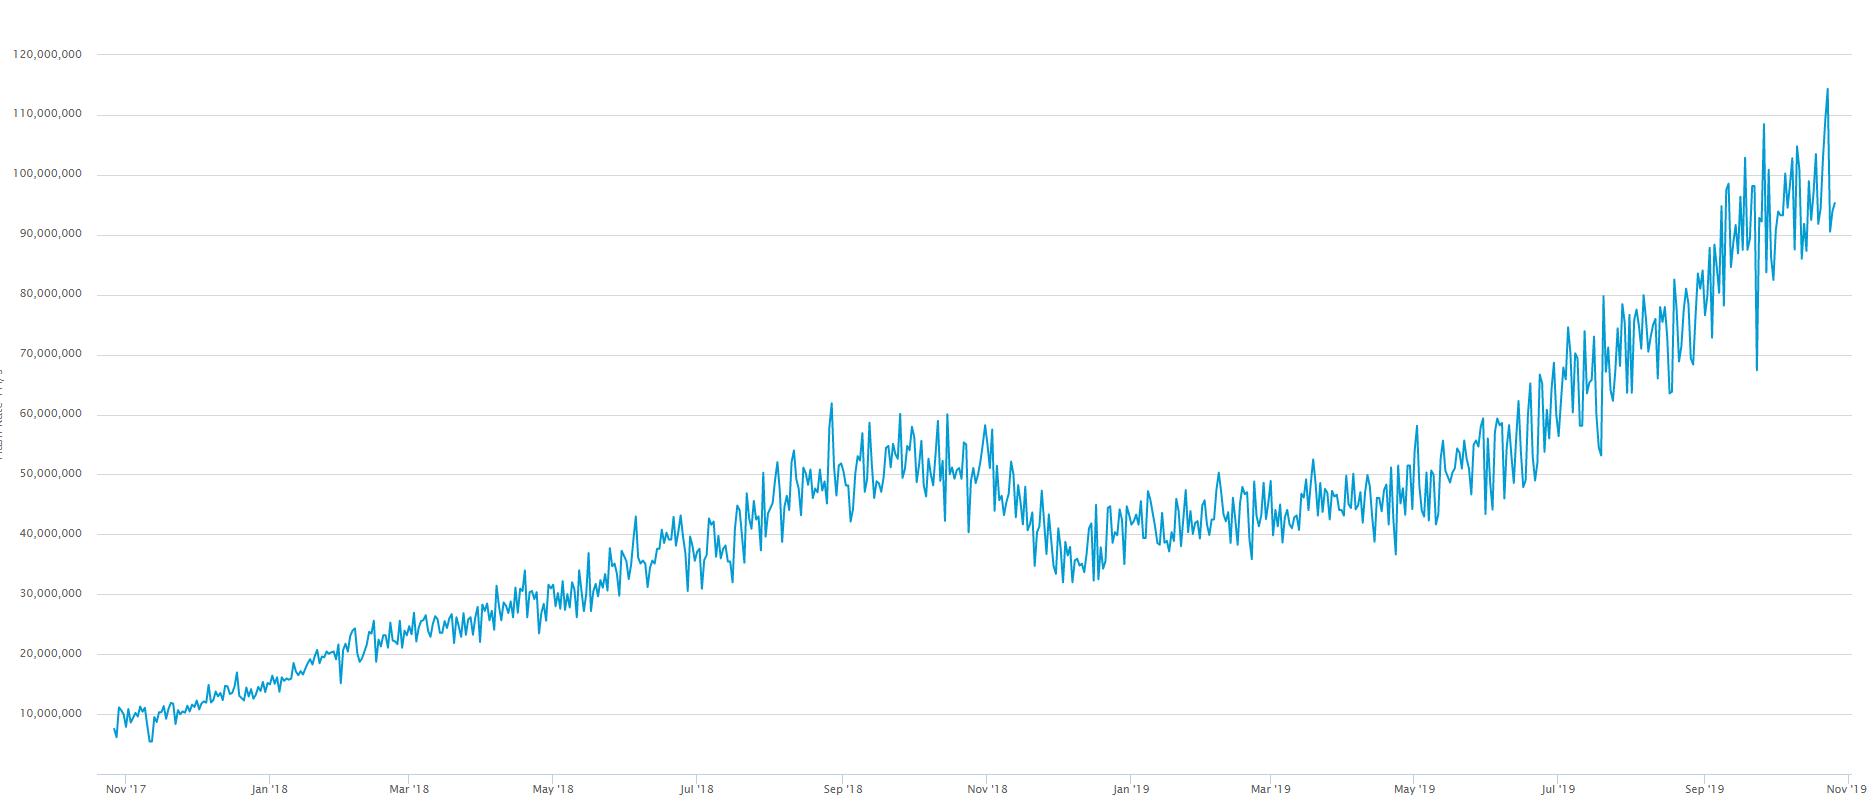 bitcoin hash rate grafiek stijging